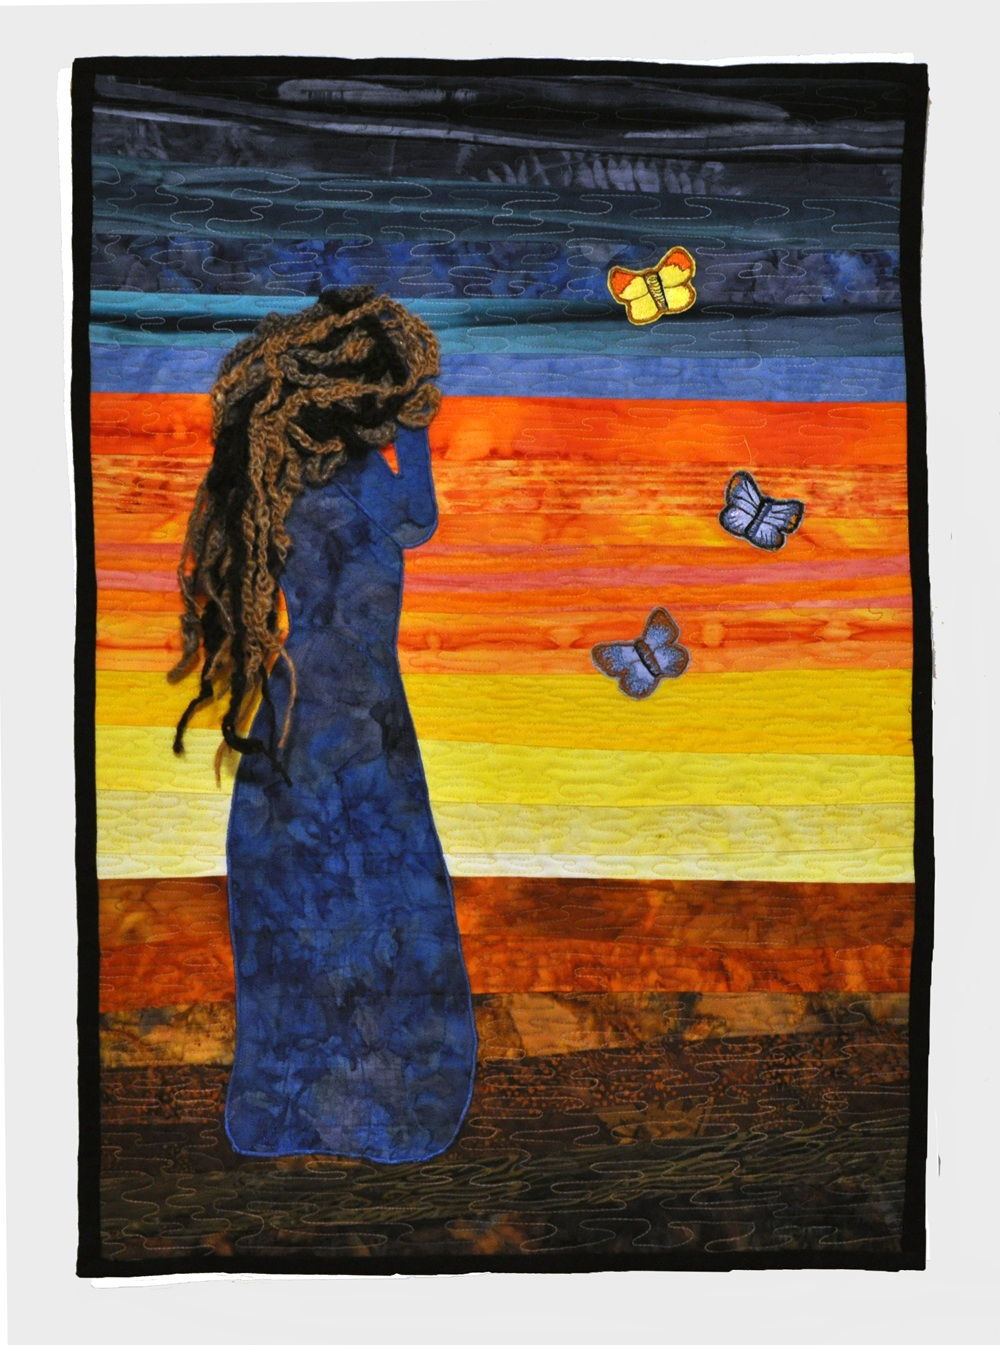 Despair and Hope by Carolyn Carlson